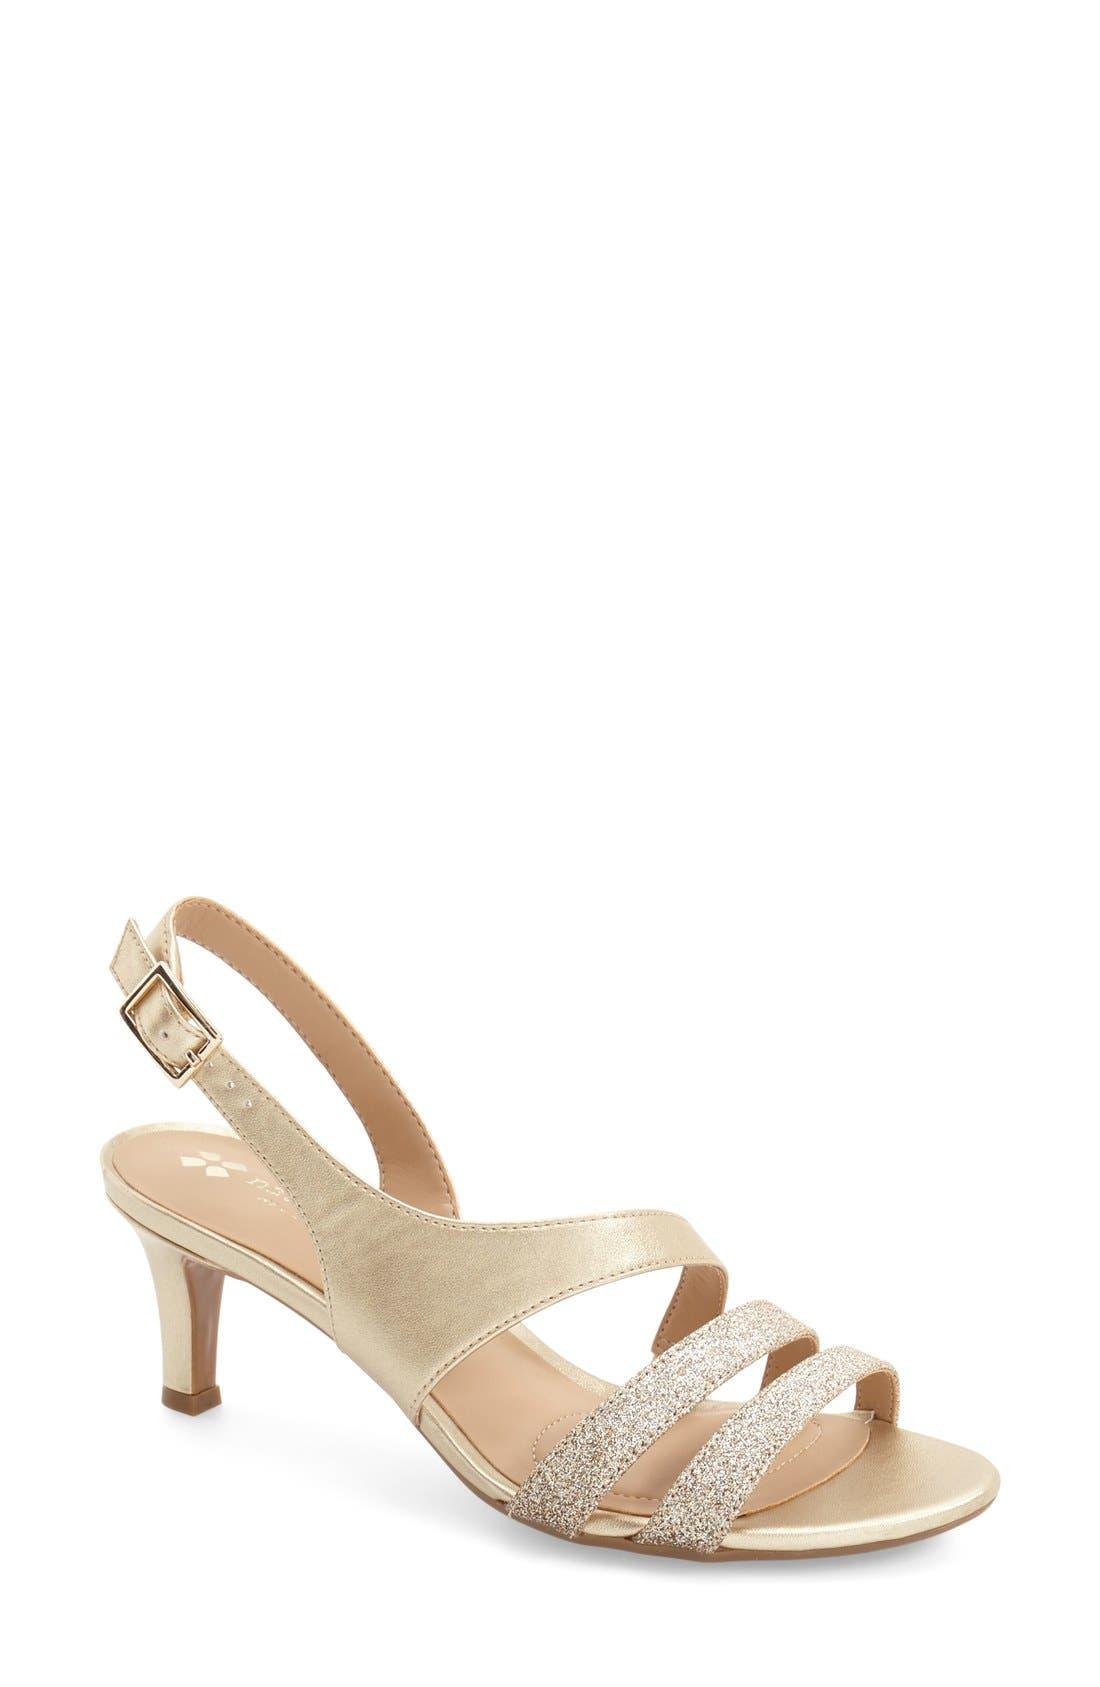 Womens Naturalizer Wedding Shoes